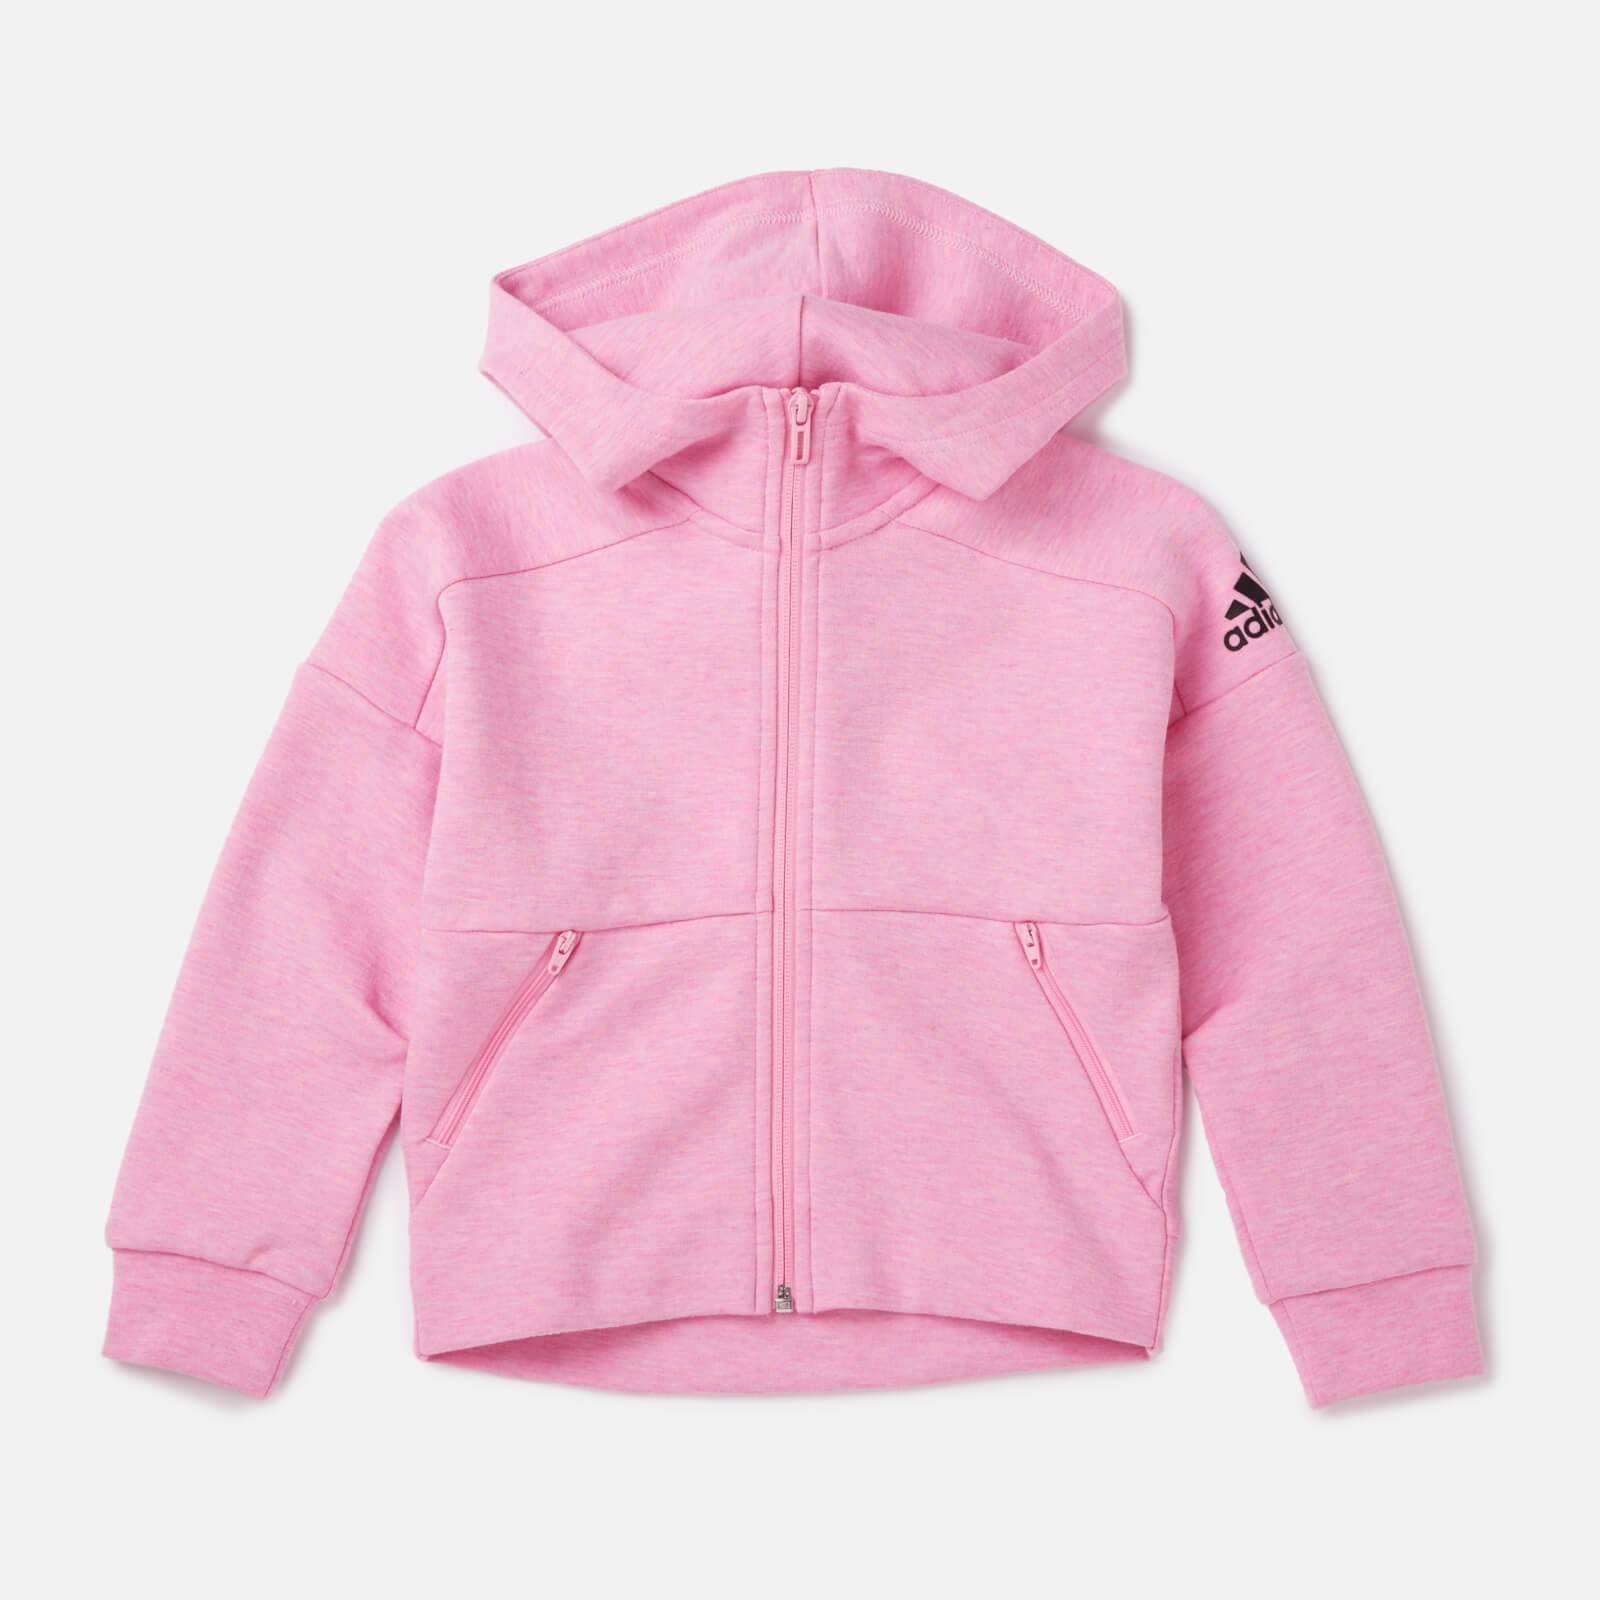 adidas Young Girls' ID STA Full Zip Hoody - Pink - 7-8 Years - Pink